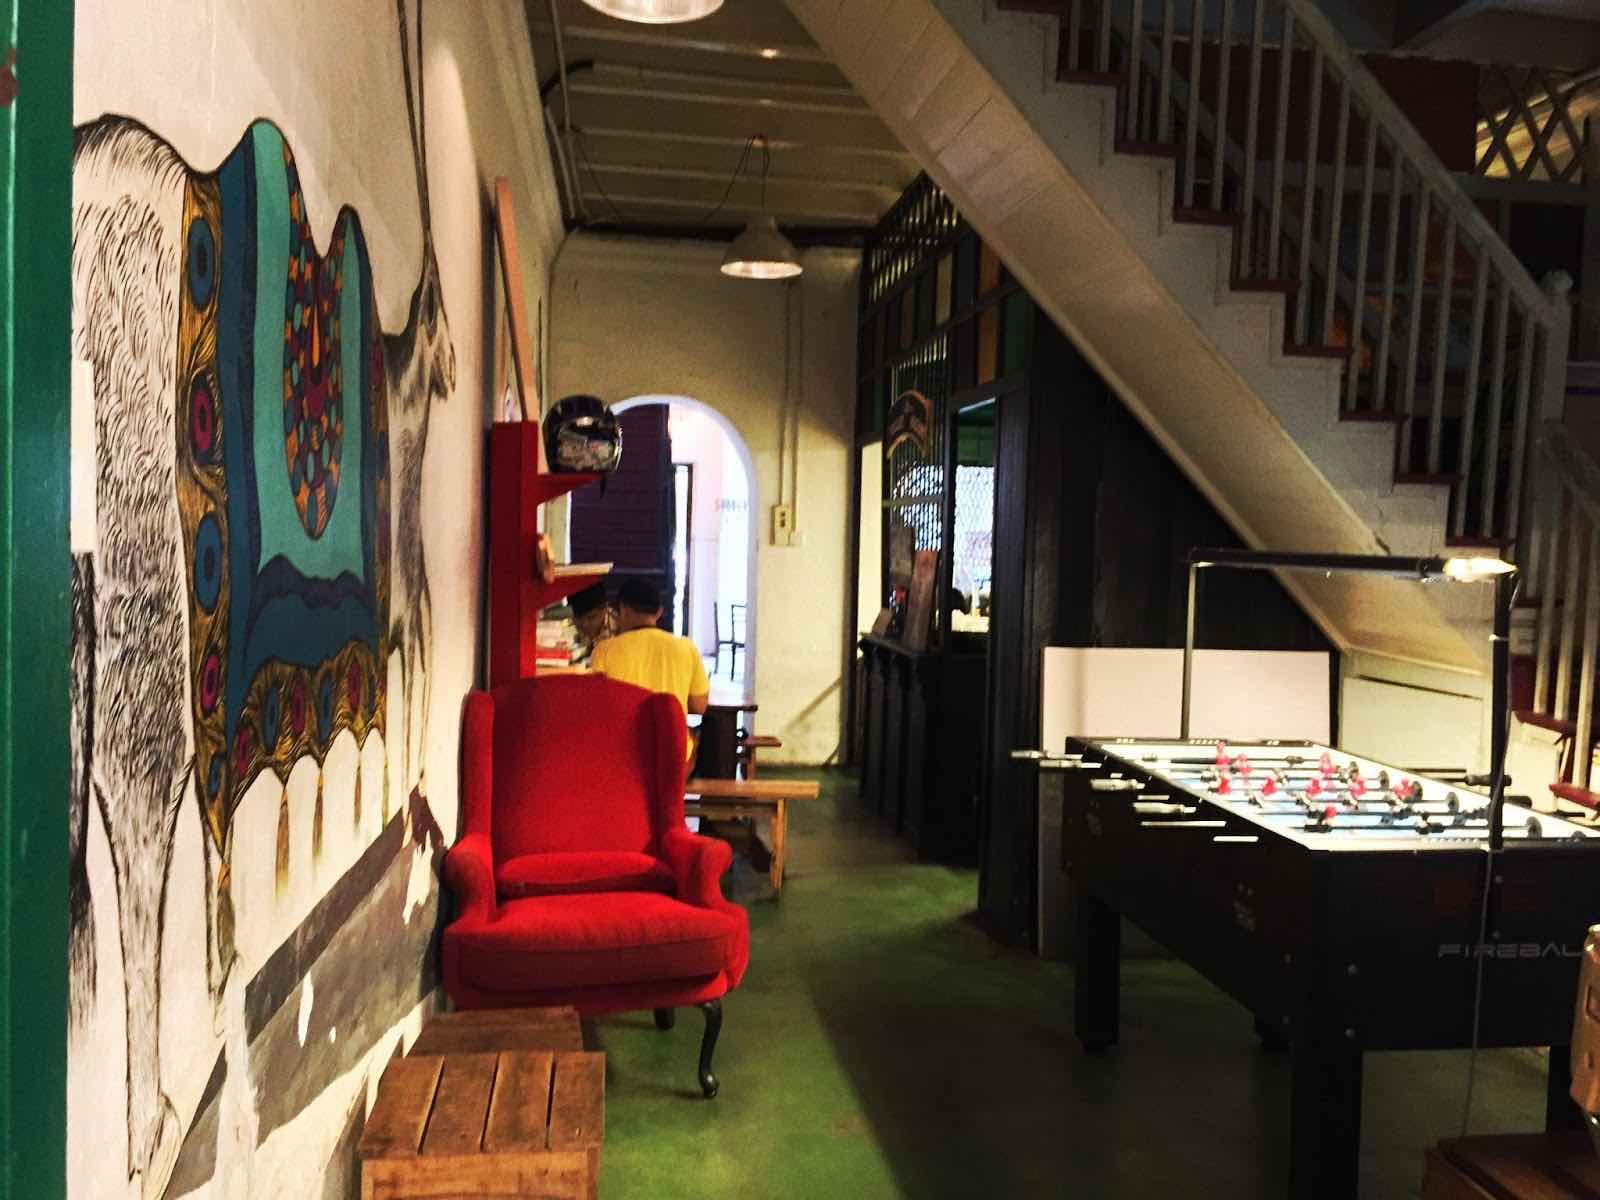 Mugshot Cafe Penang - AspirantSG